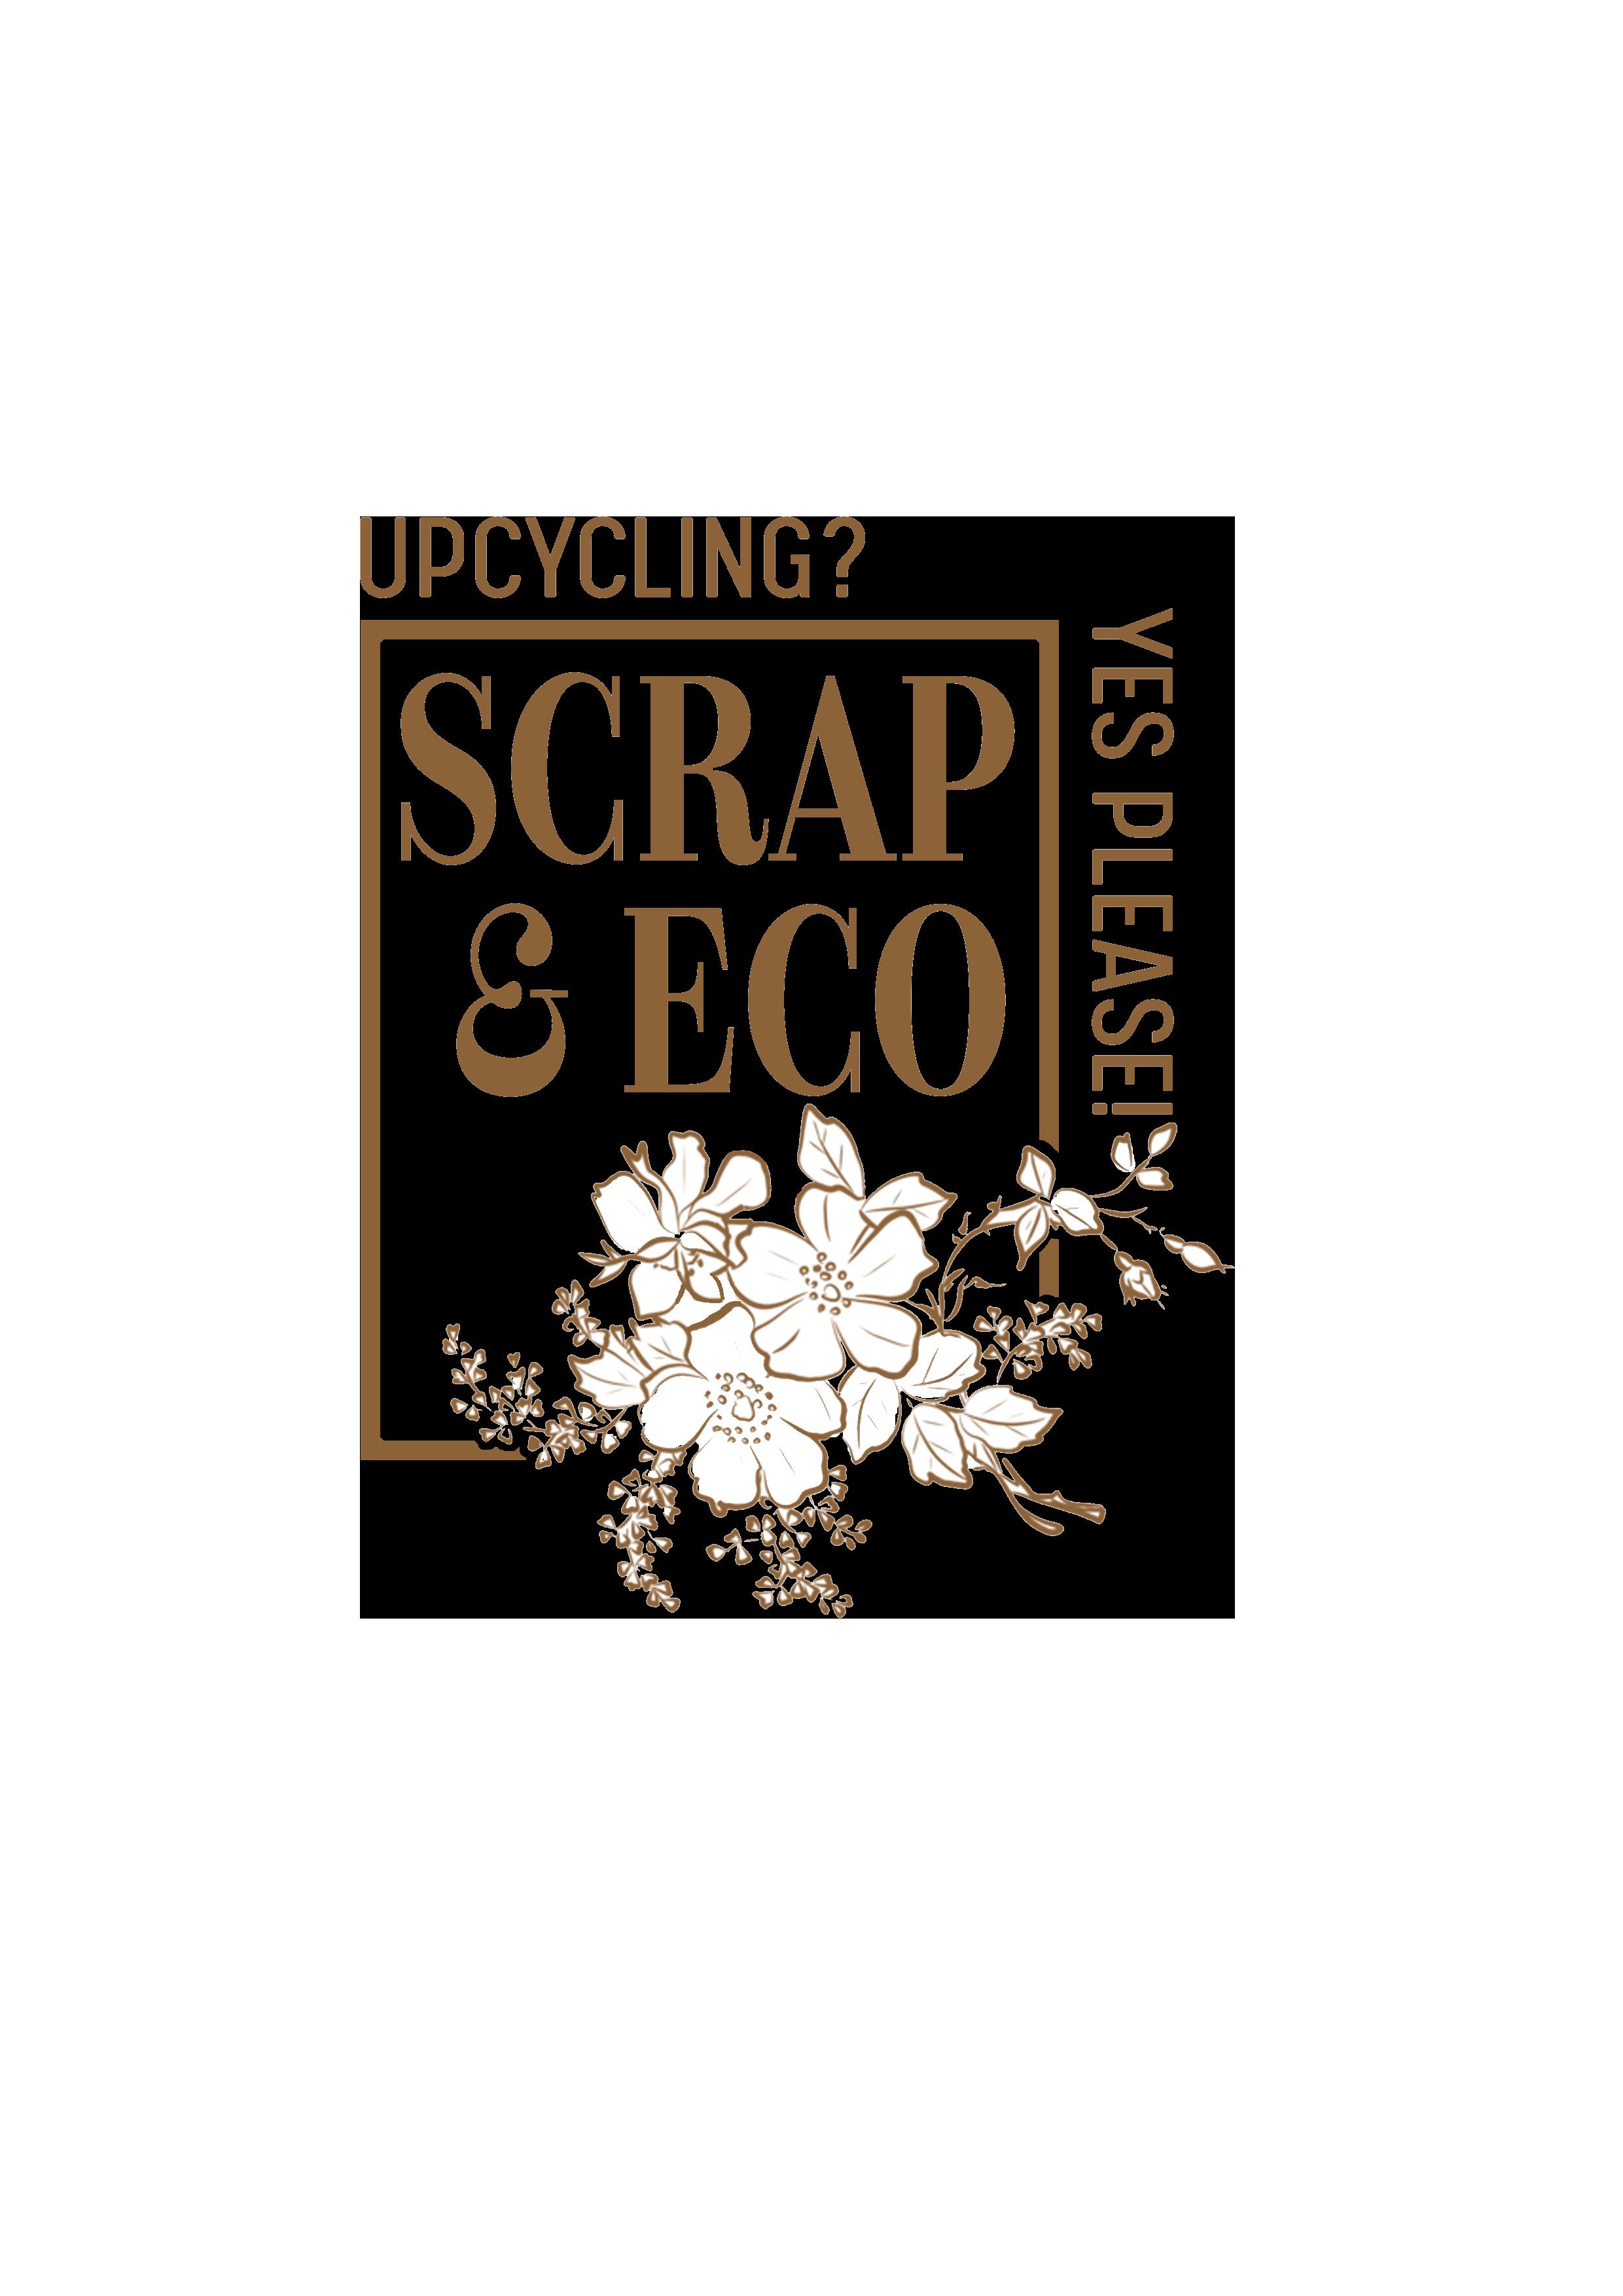 scrap eco square